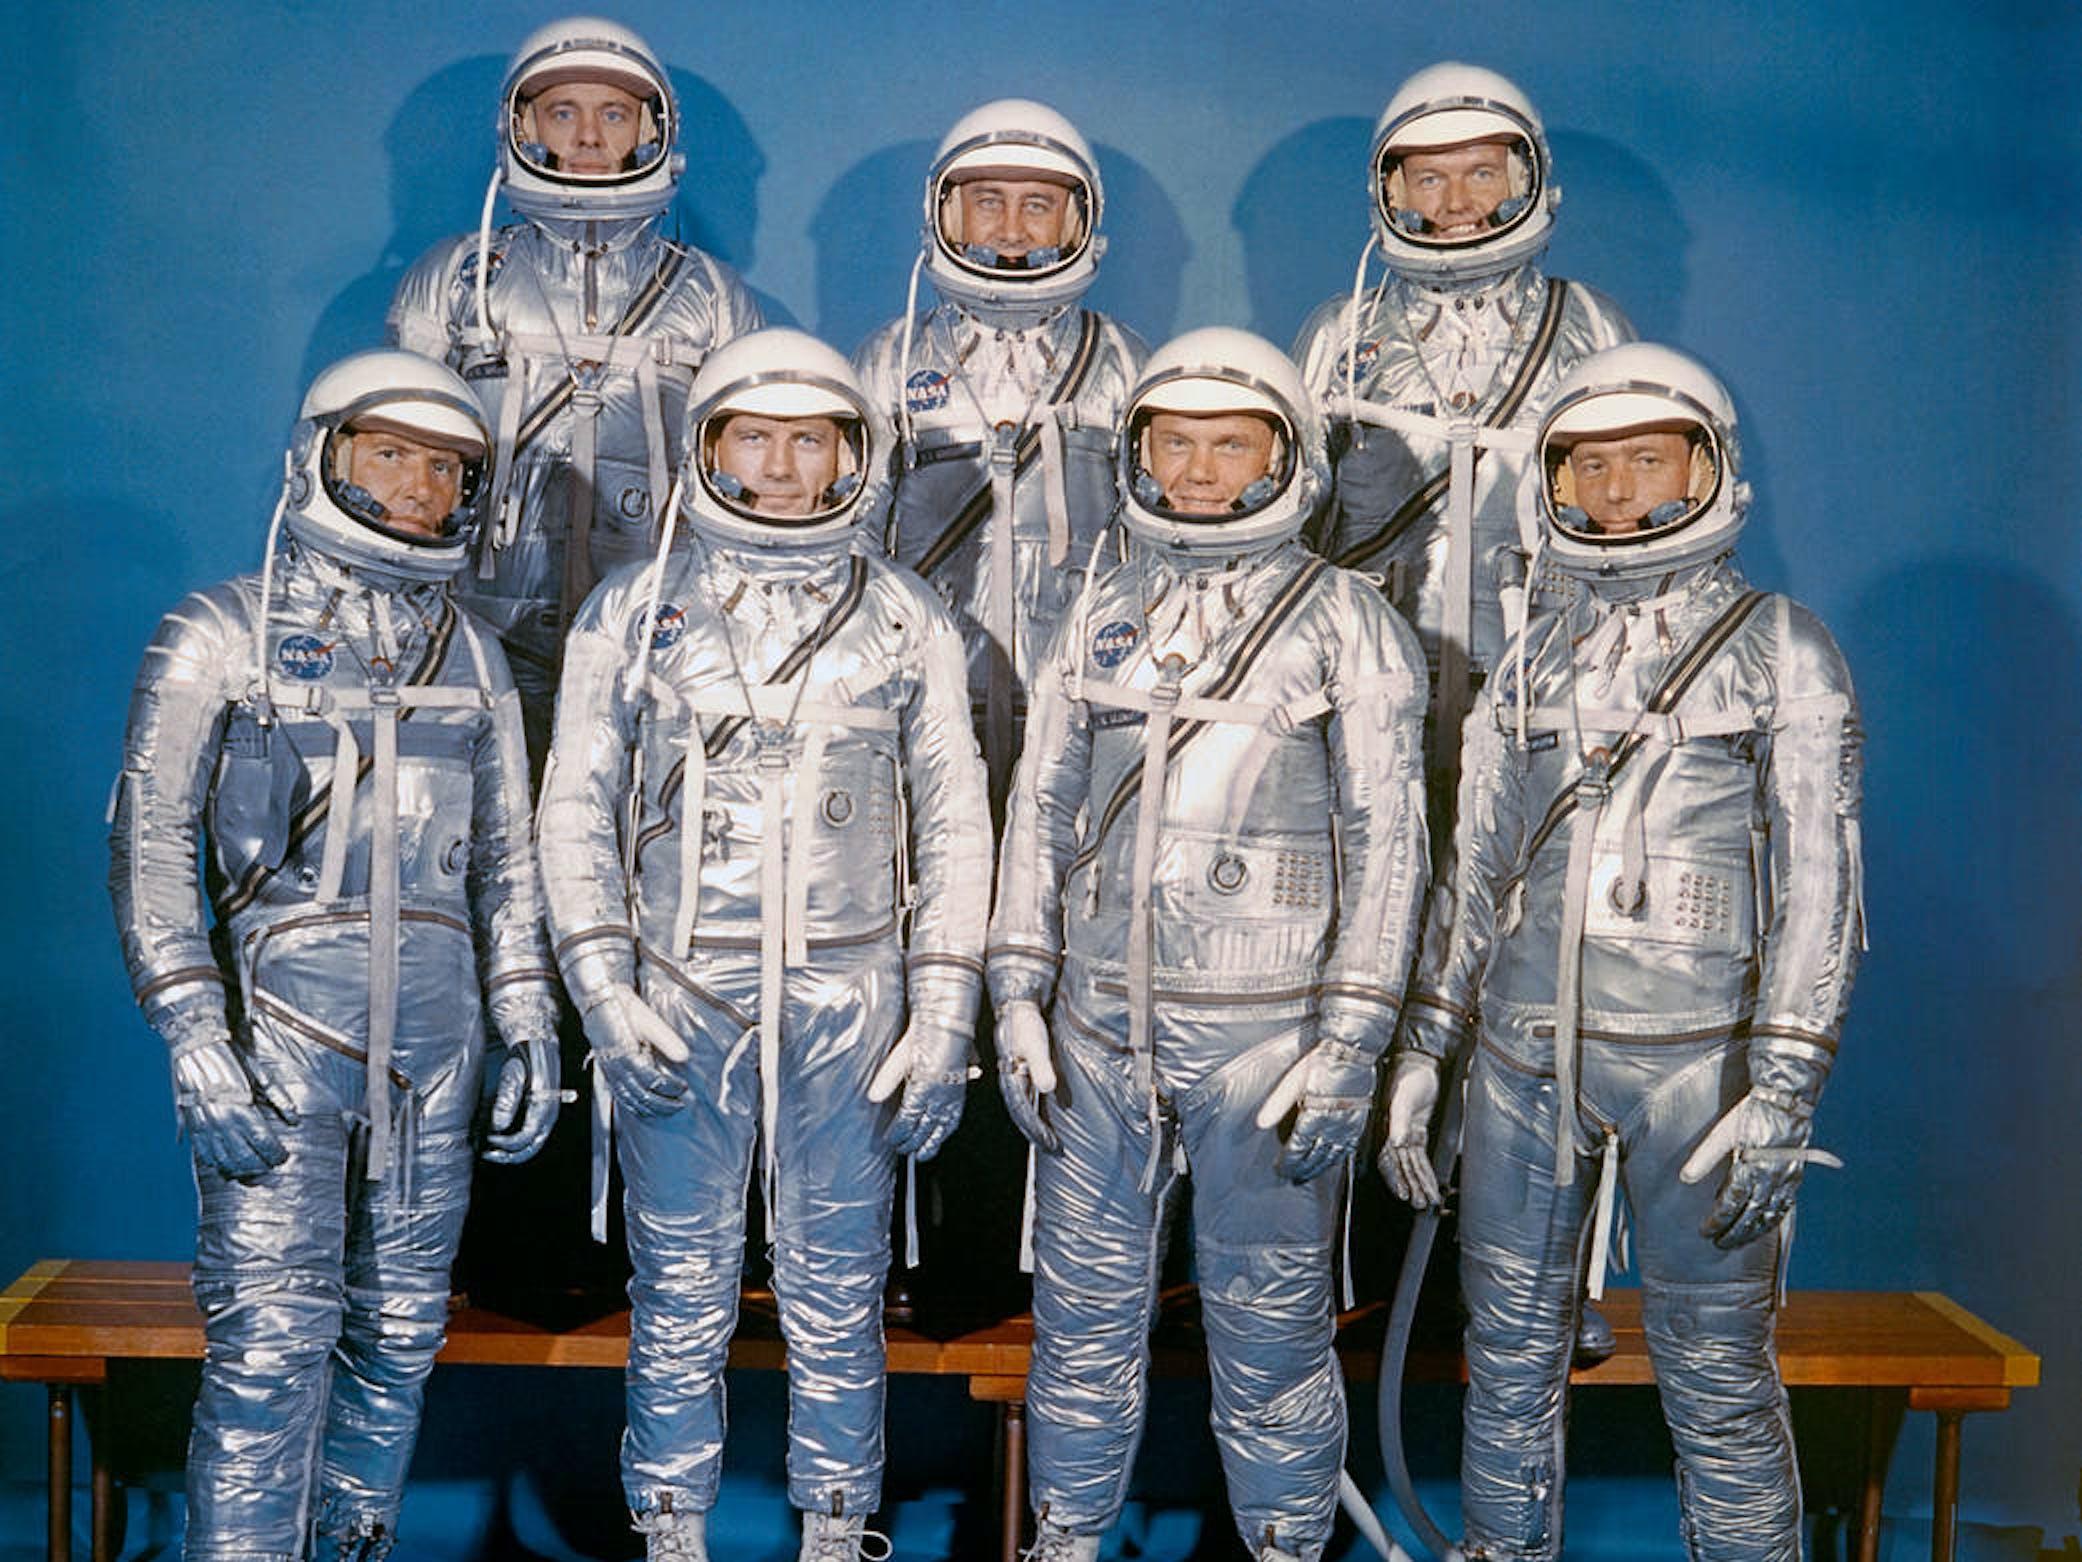 spacesuits nasa final frontier astronauts